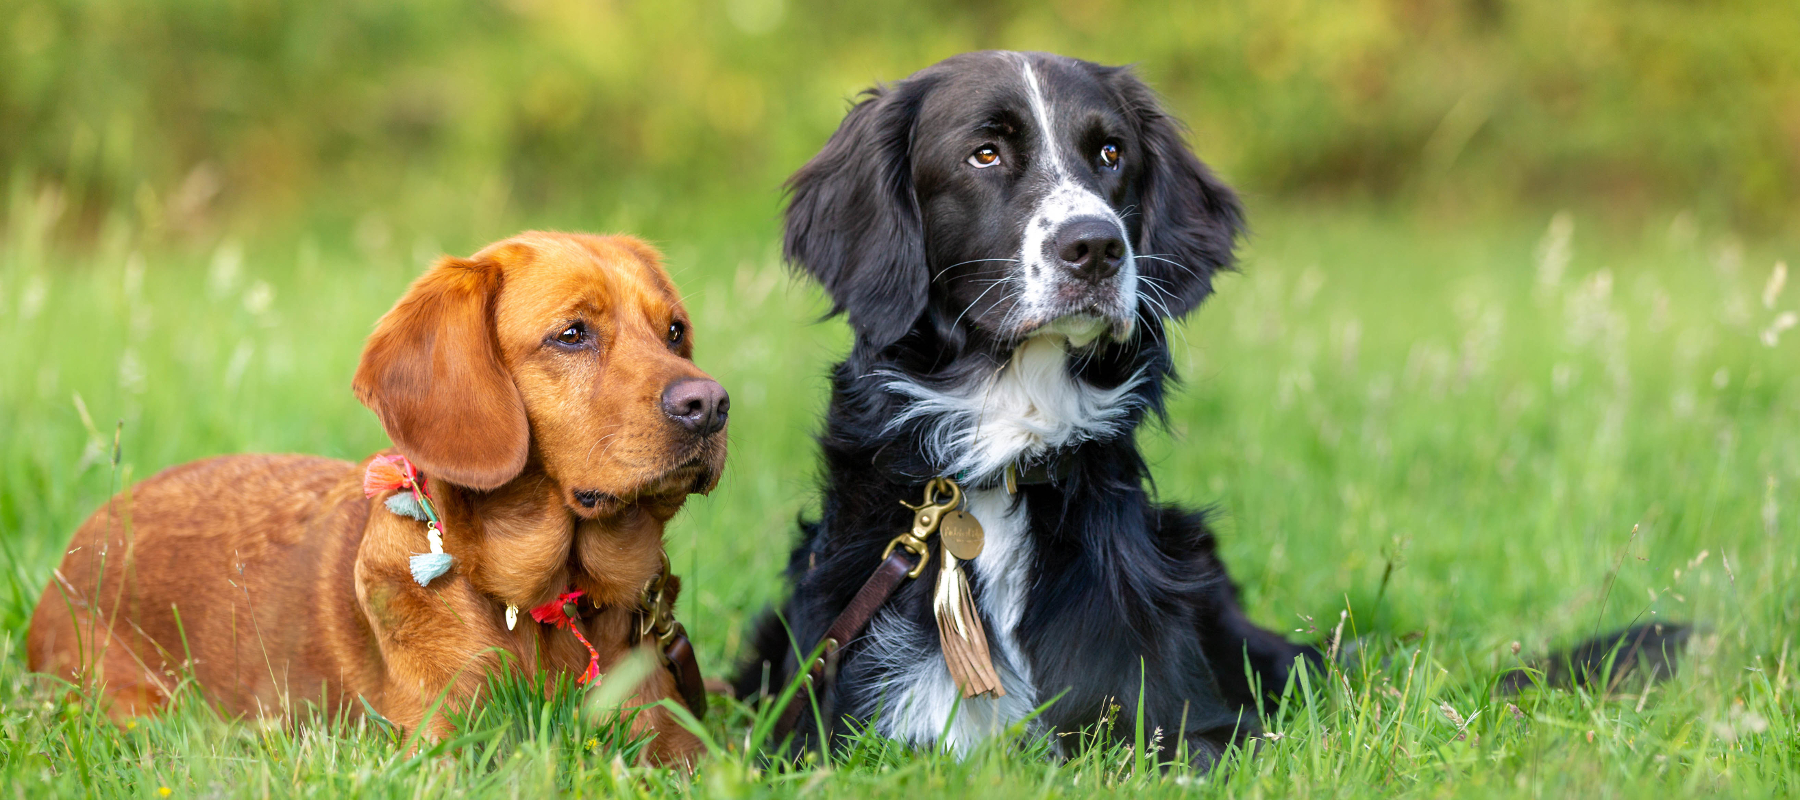 RudelJahr - Hundeakademie RudelHerzen Stefanie Baumer